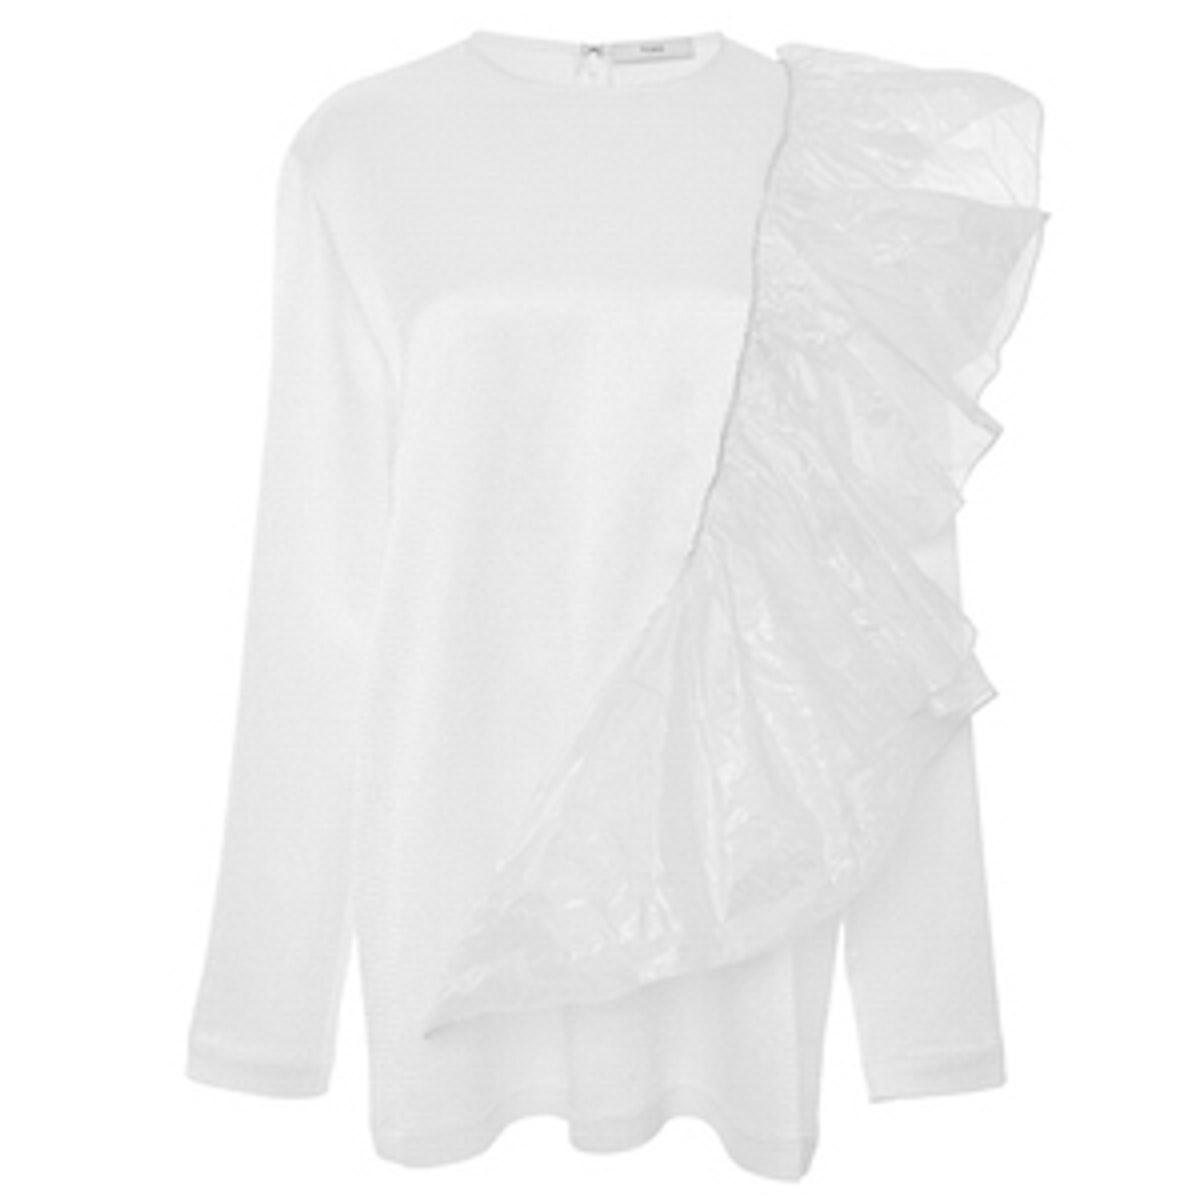 White Long Sleeve Shirt With Ruffle